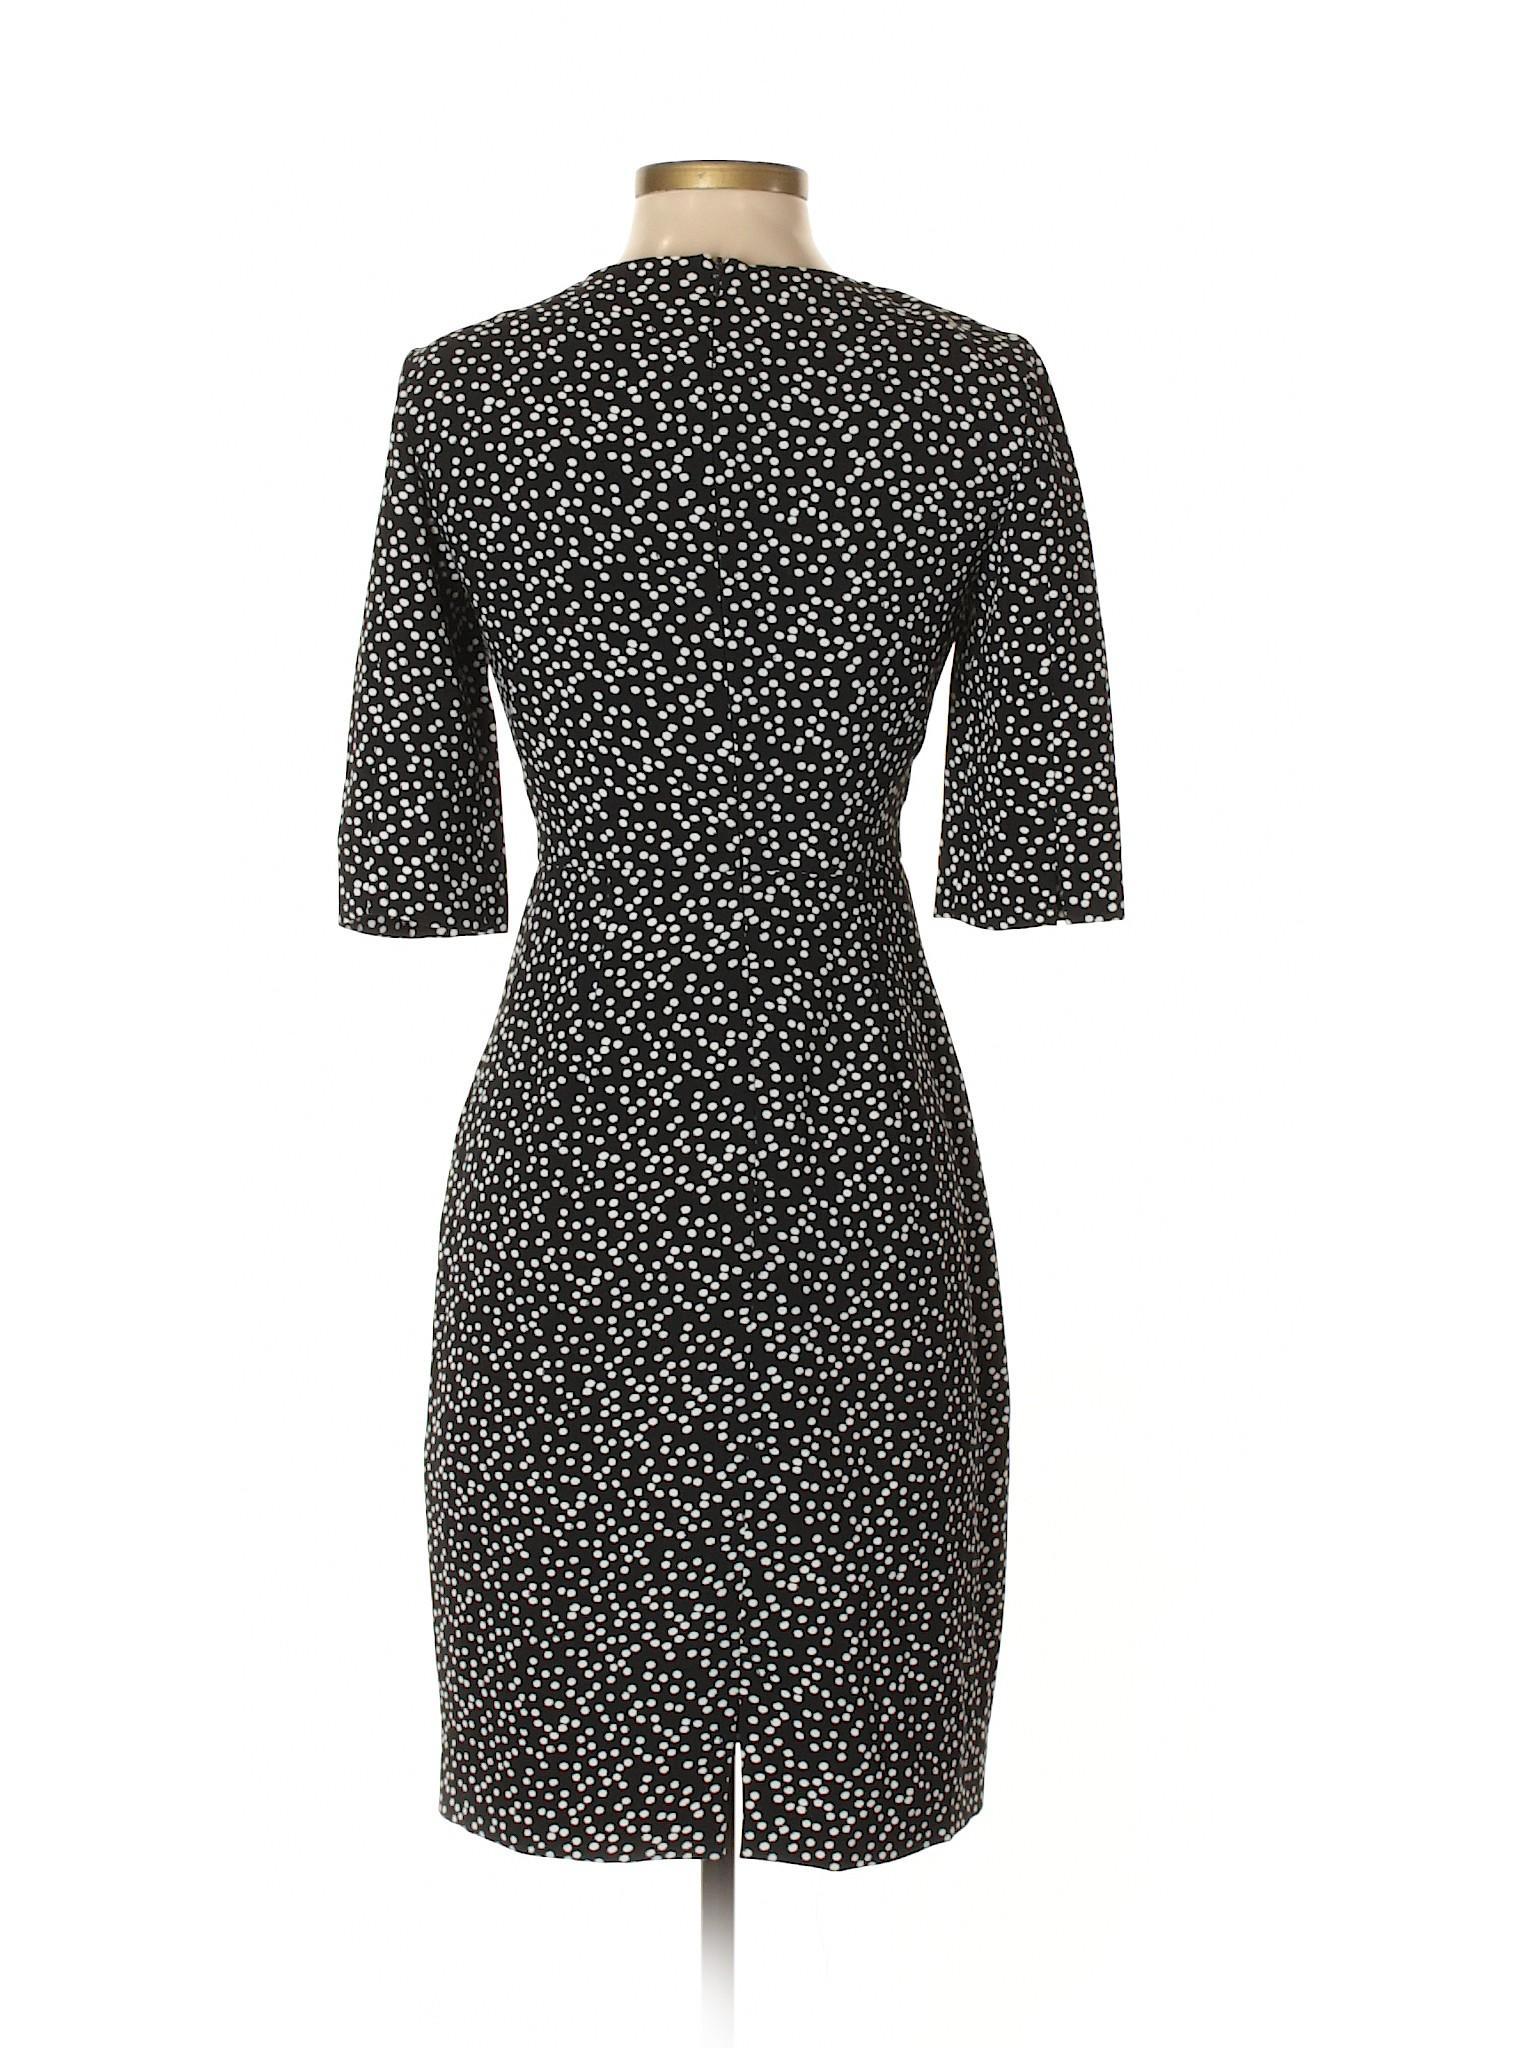 L Casual Dress Bennett winter K Boutique qwSvO5nI4